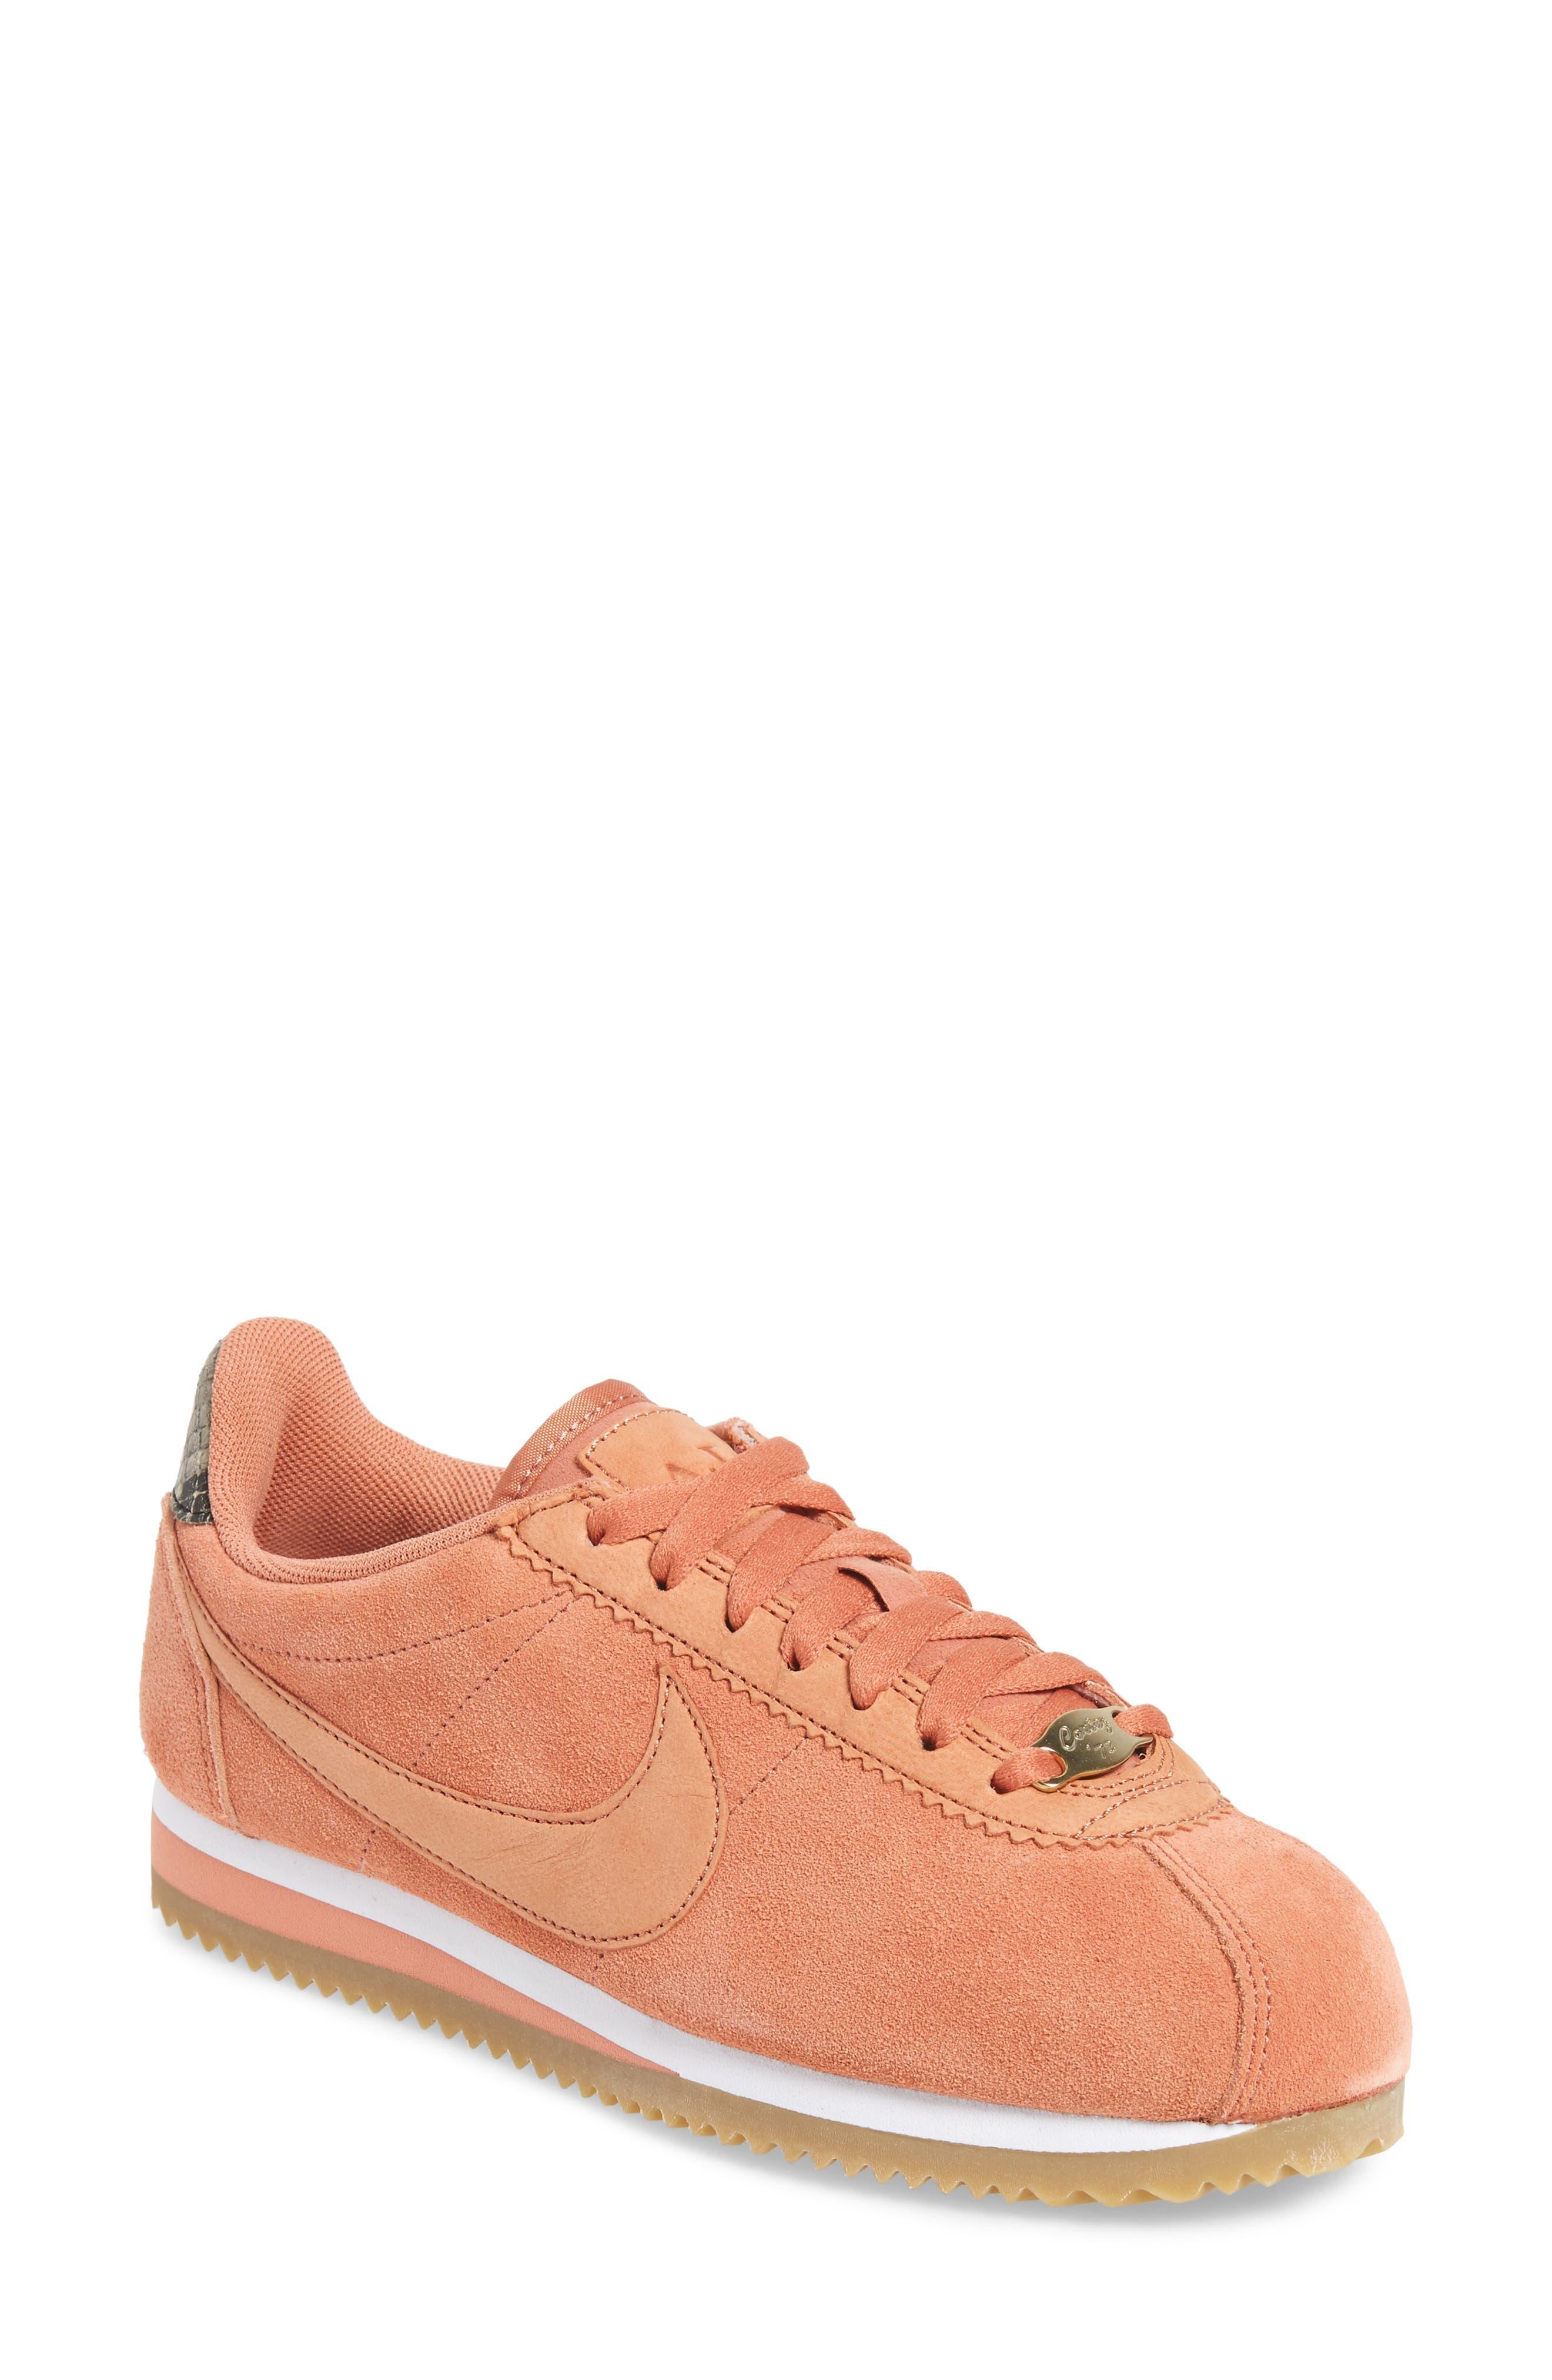 Alternate Image 1 Selected - Nike x A.L.C. Classic Cortez Sneaker (Women)